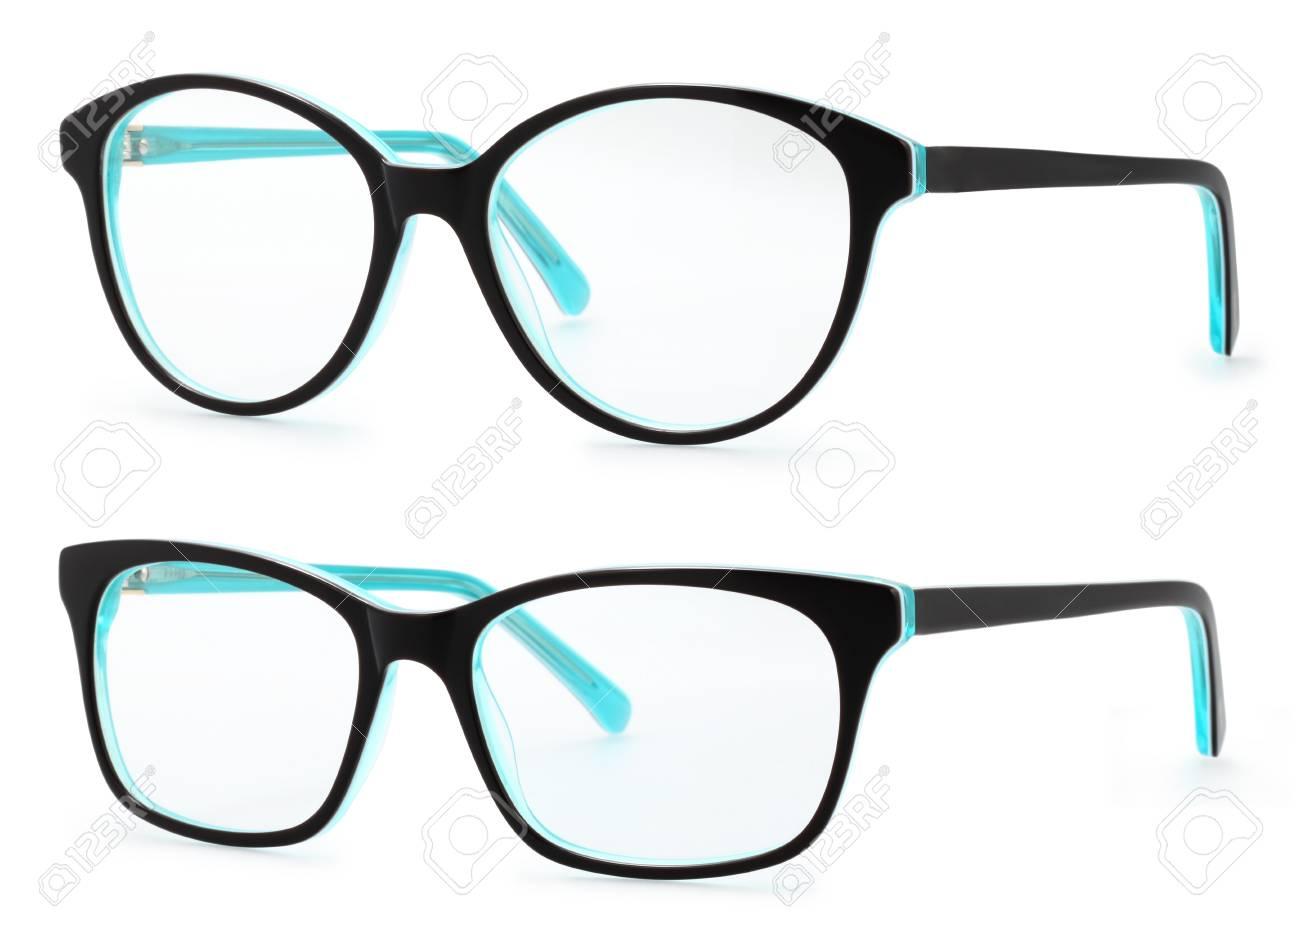 Black Glasses Lost At St Brigid's Miscellany